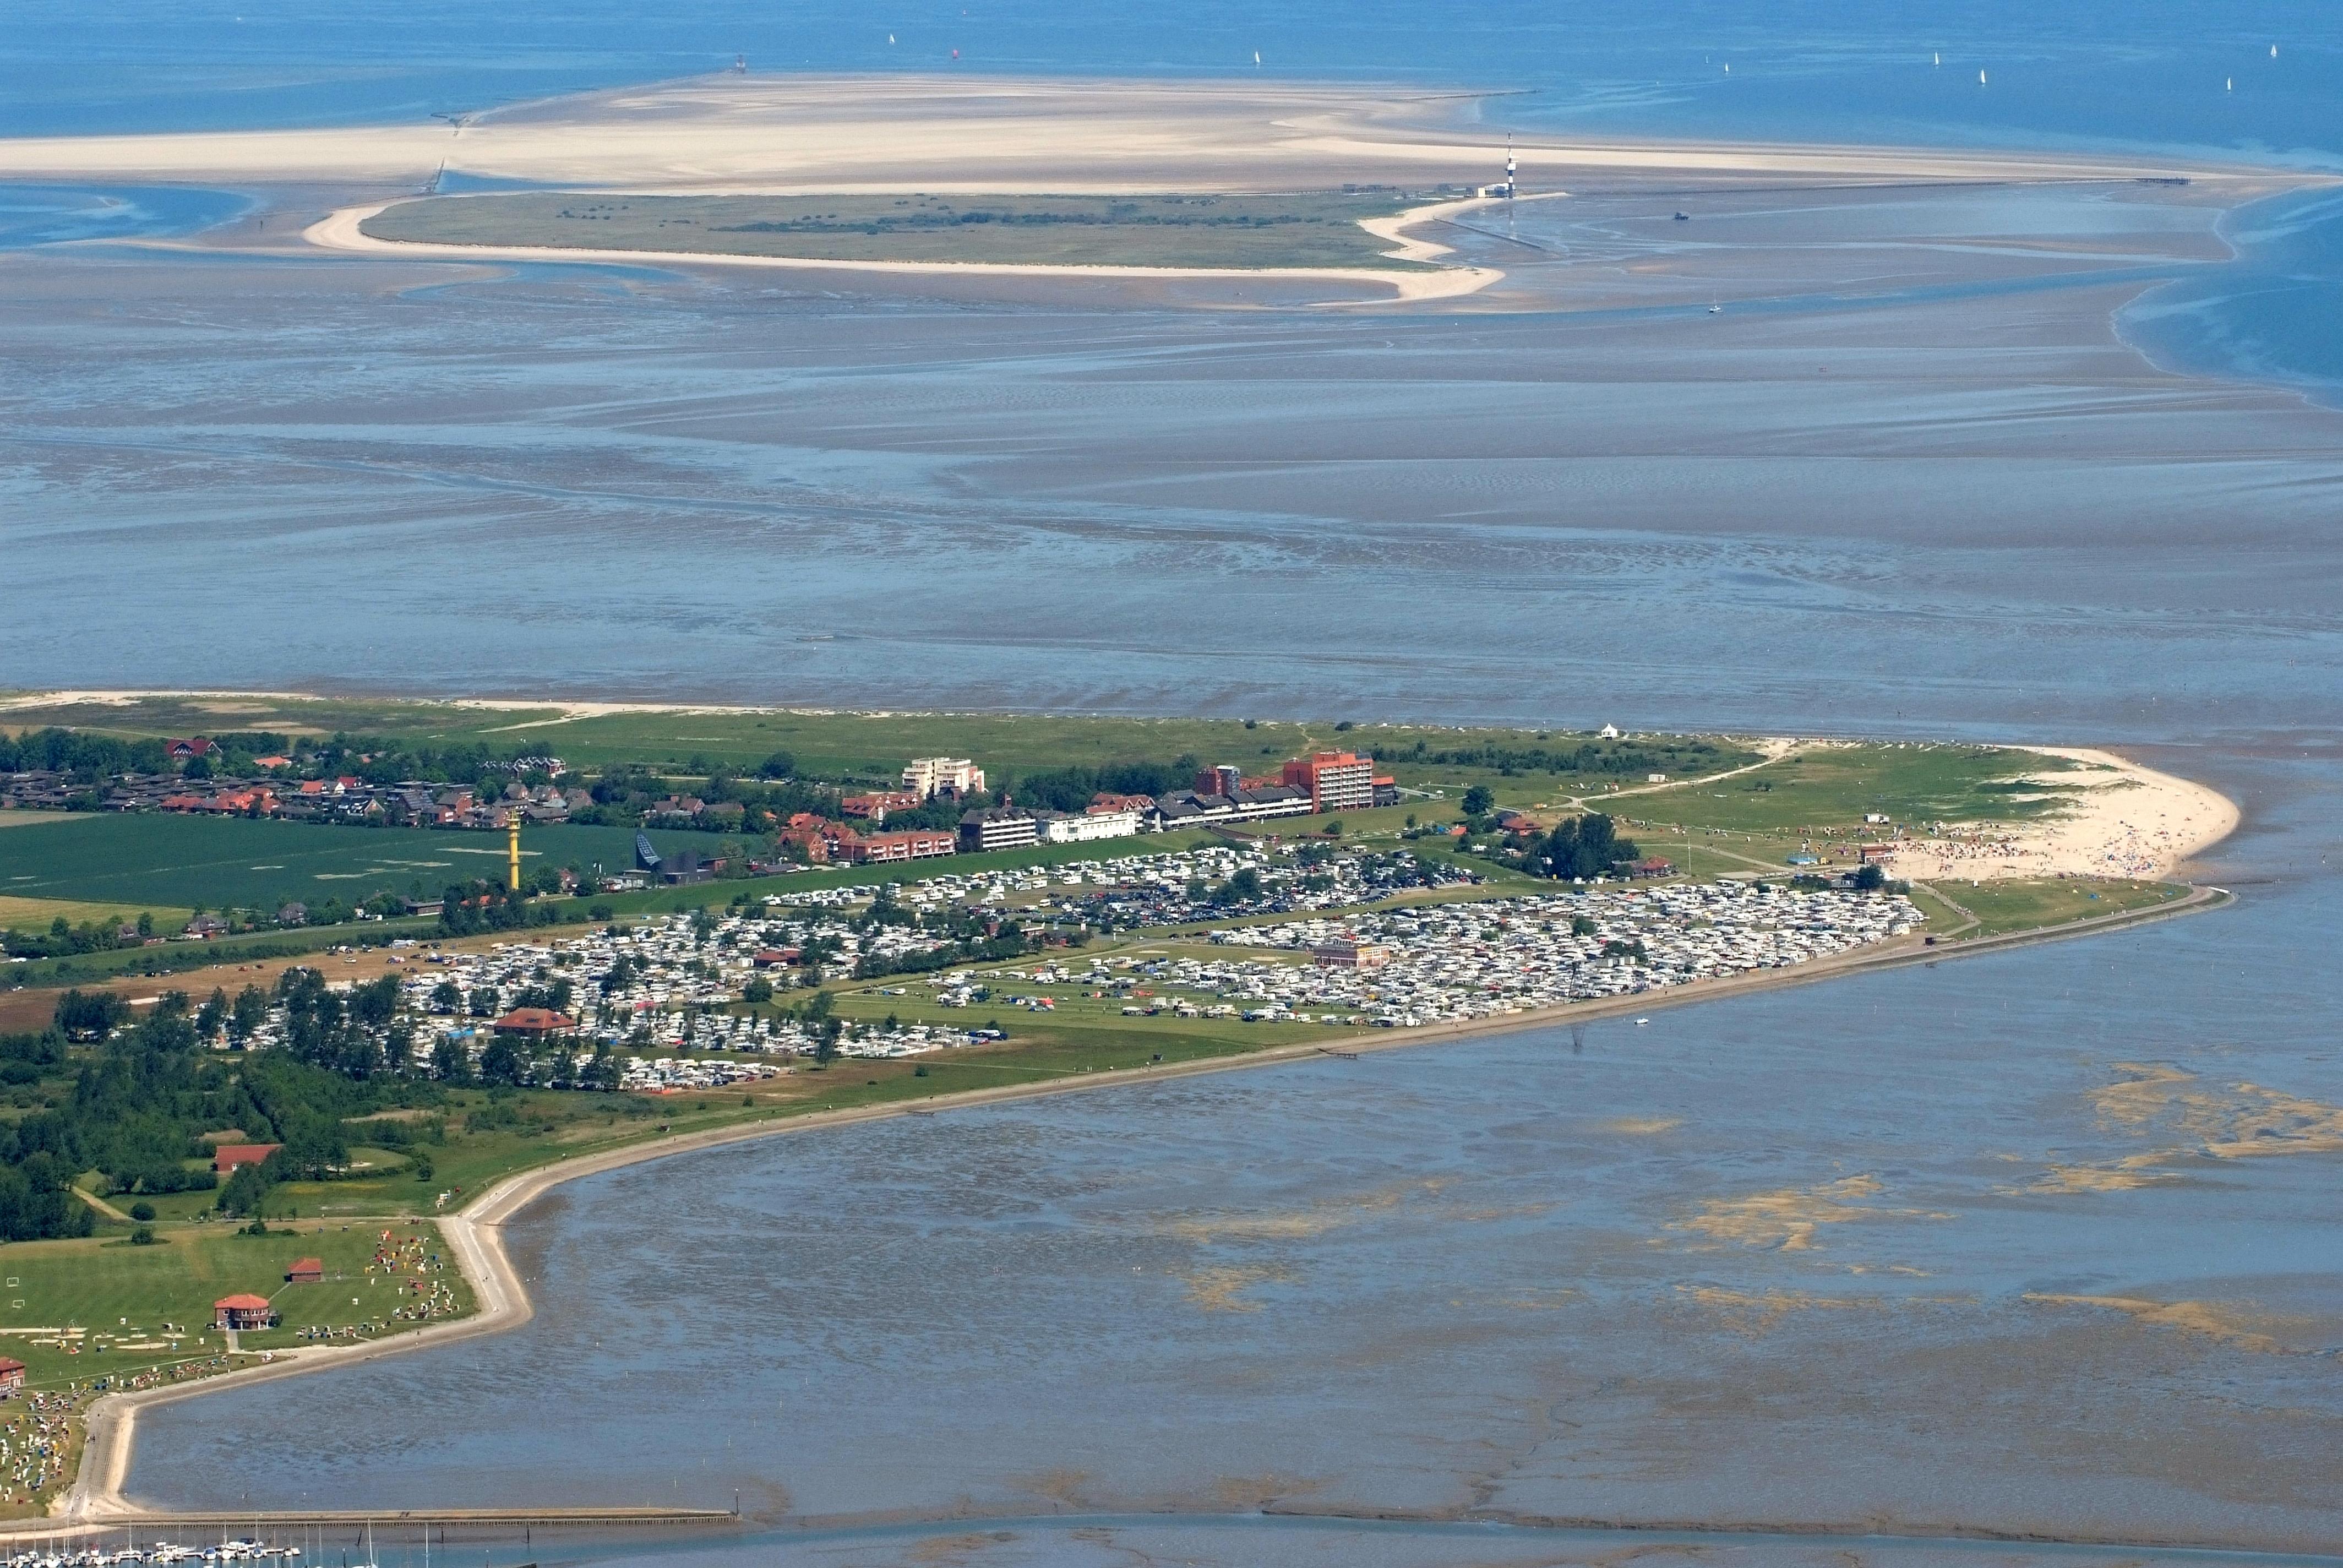 File:2012-05-28 Fotoflug Cuxhaven Wilhelmshaven DSCF9601.jpg ...